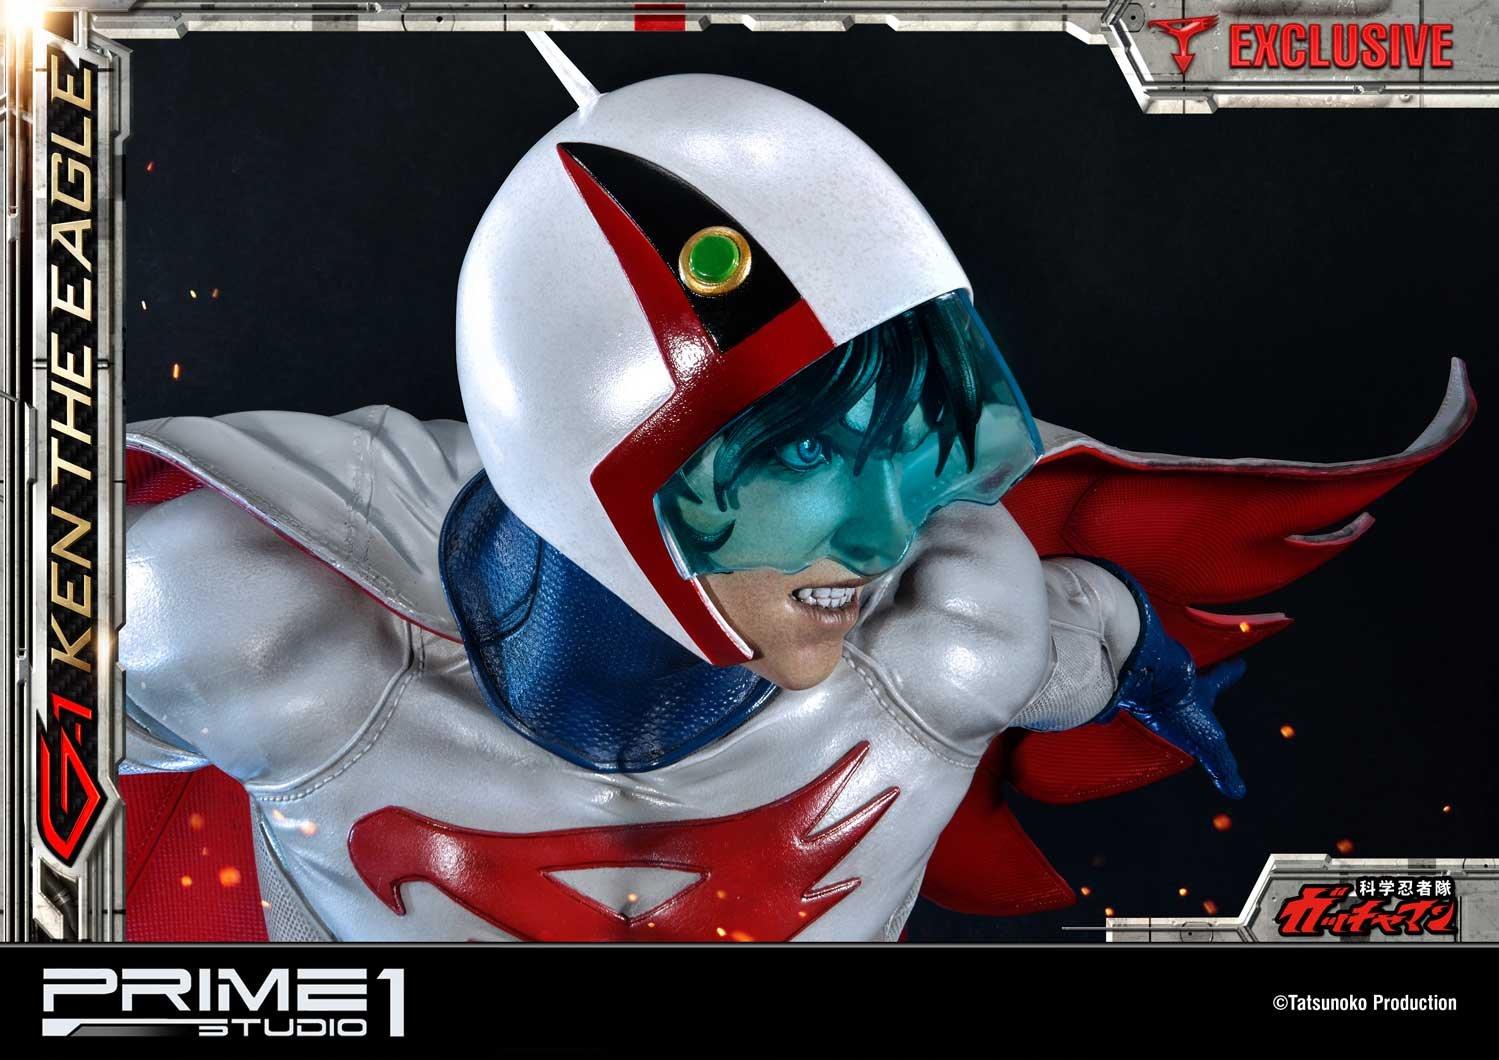 Prime-1-Gatchaman-Ken-Statue-052.jpg.53ad8cb228049f6323af09e626b57a8e.jpg